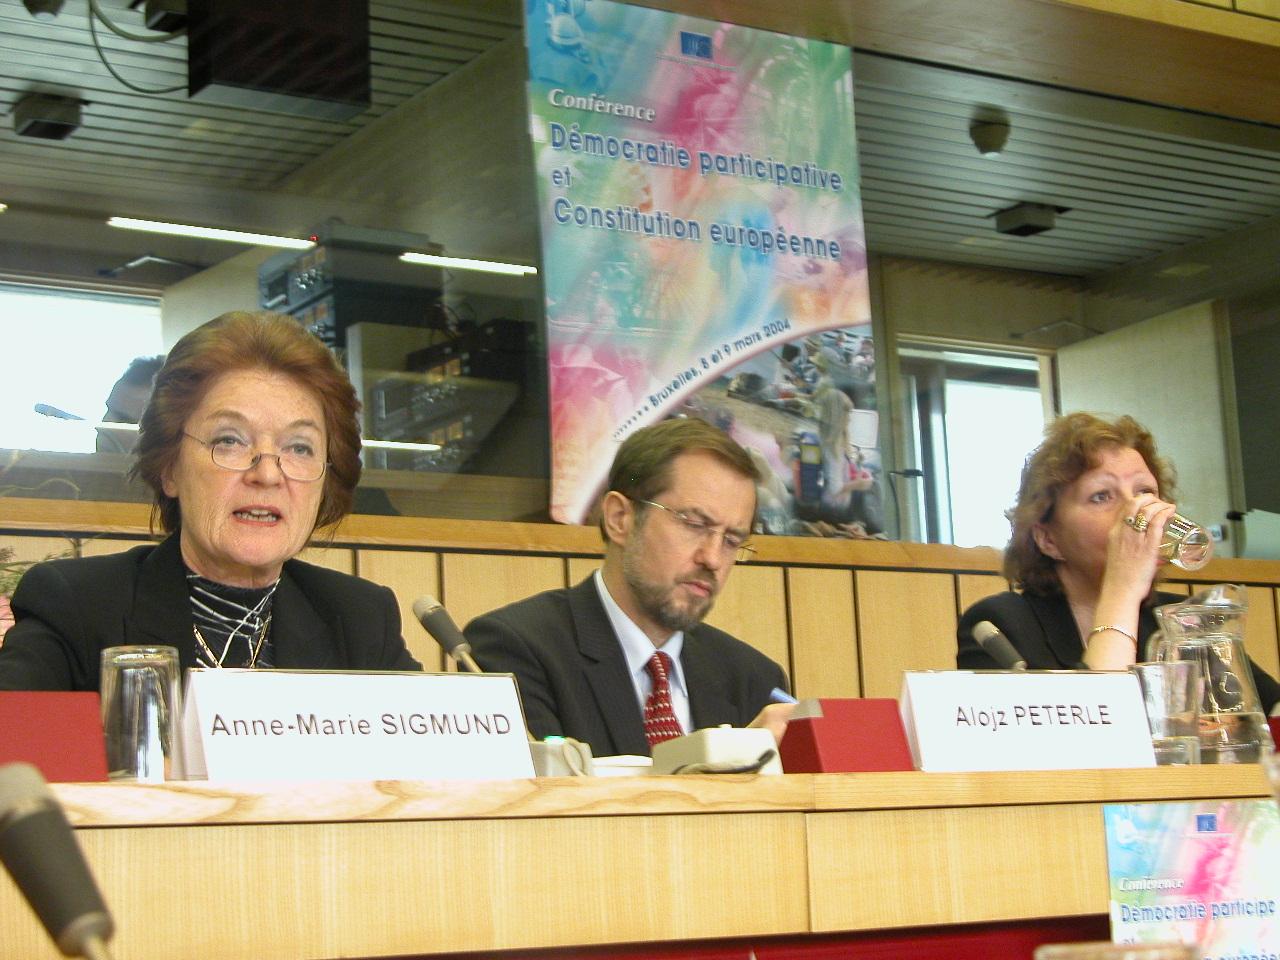 Ms Anne-Marie SIGMUND, GroMr Alojz PETERLE, Prof. Daniela OBRADOVIC